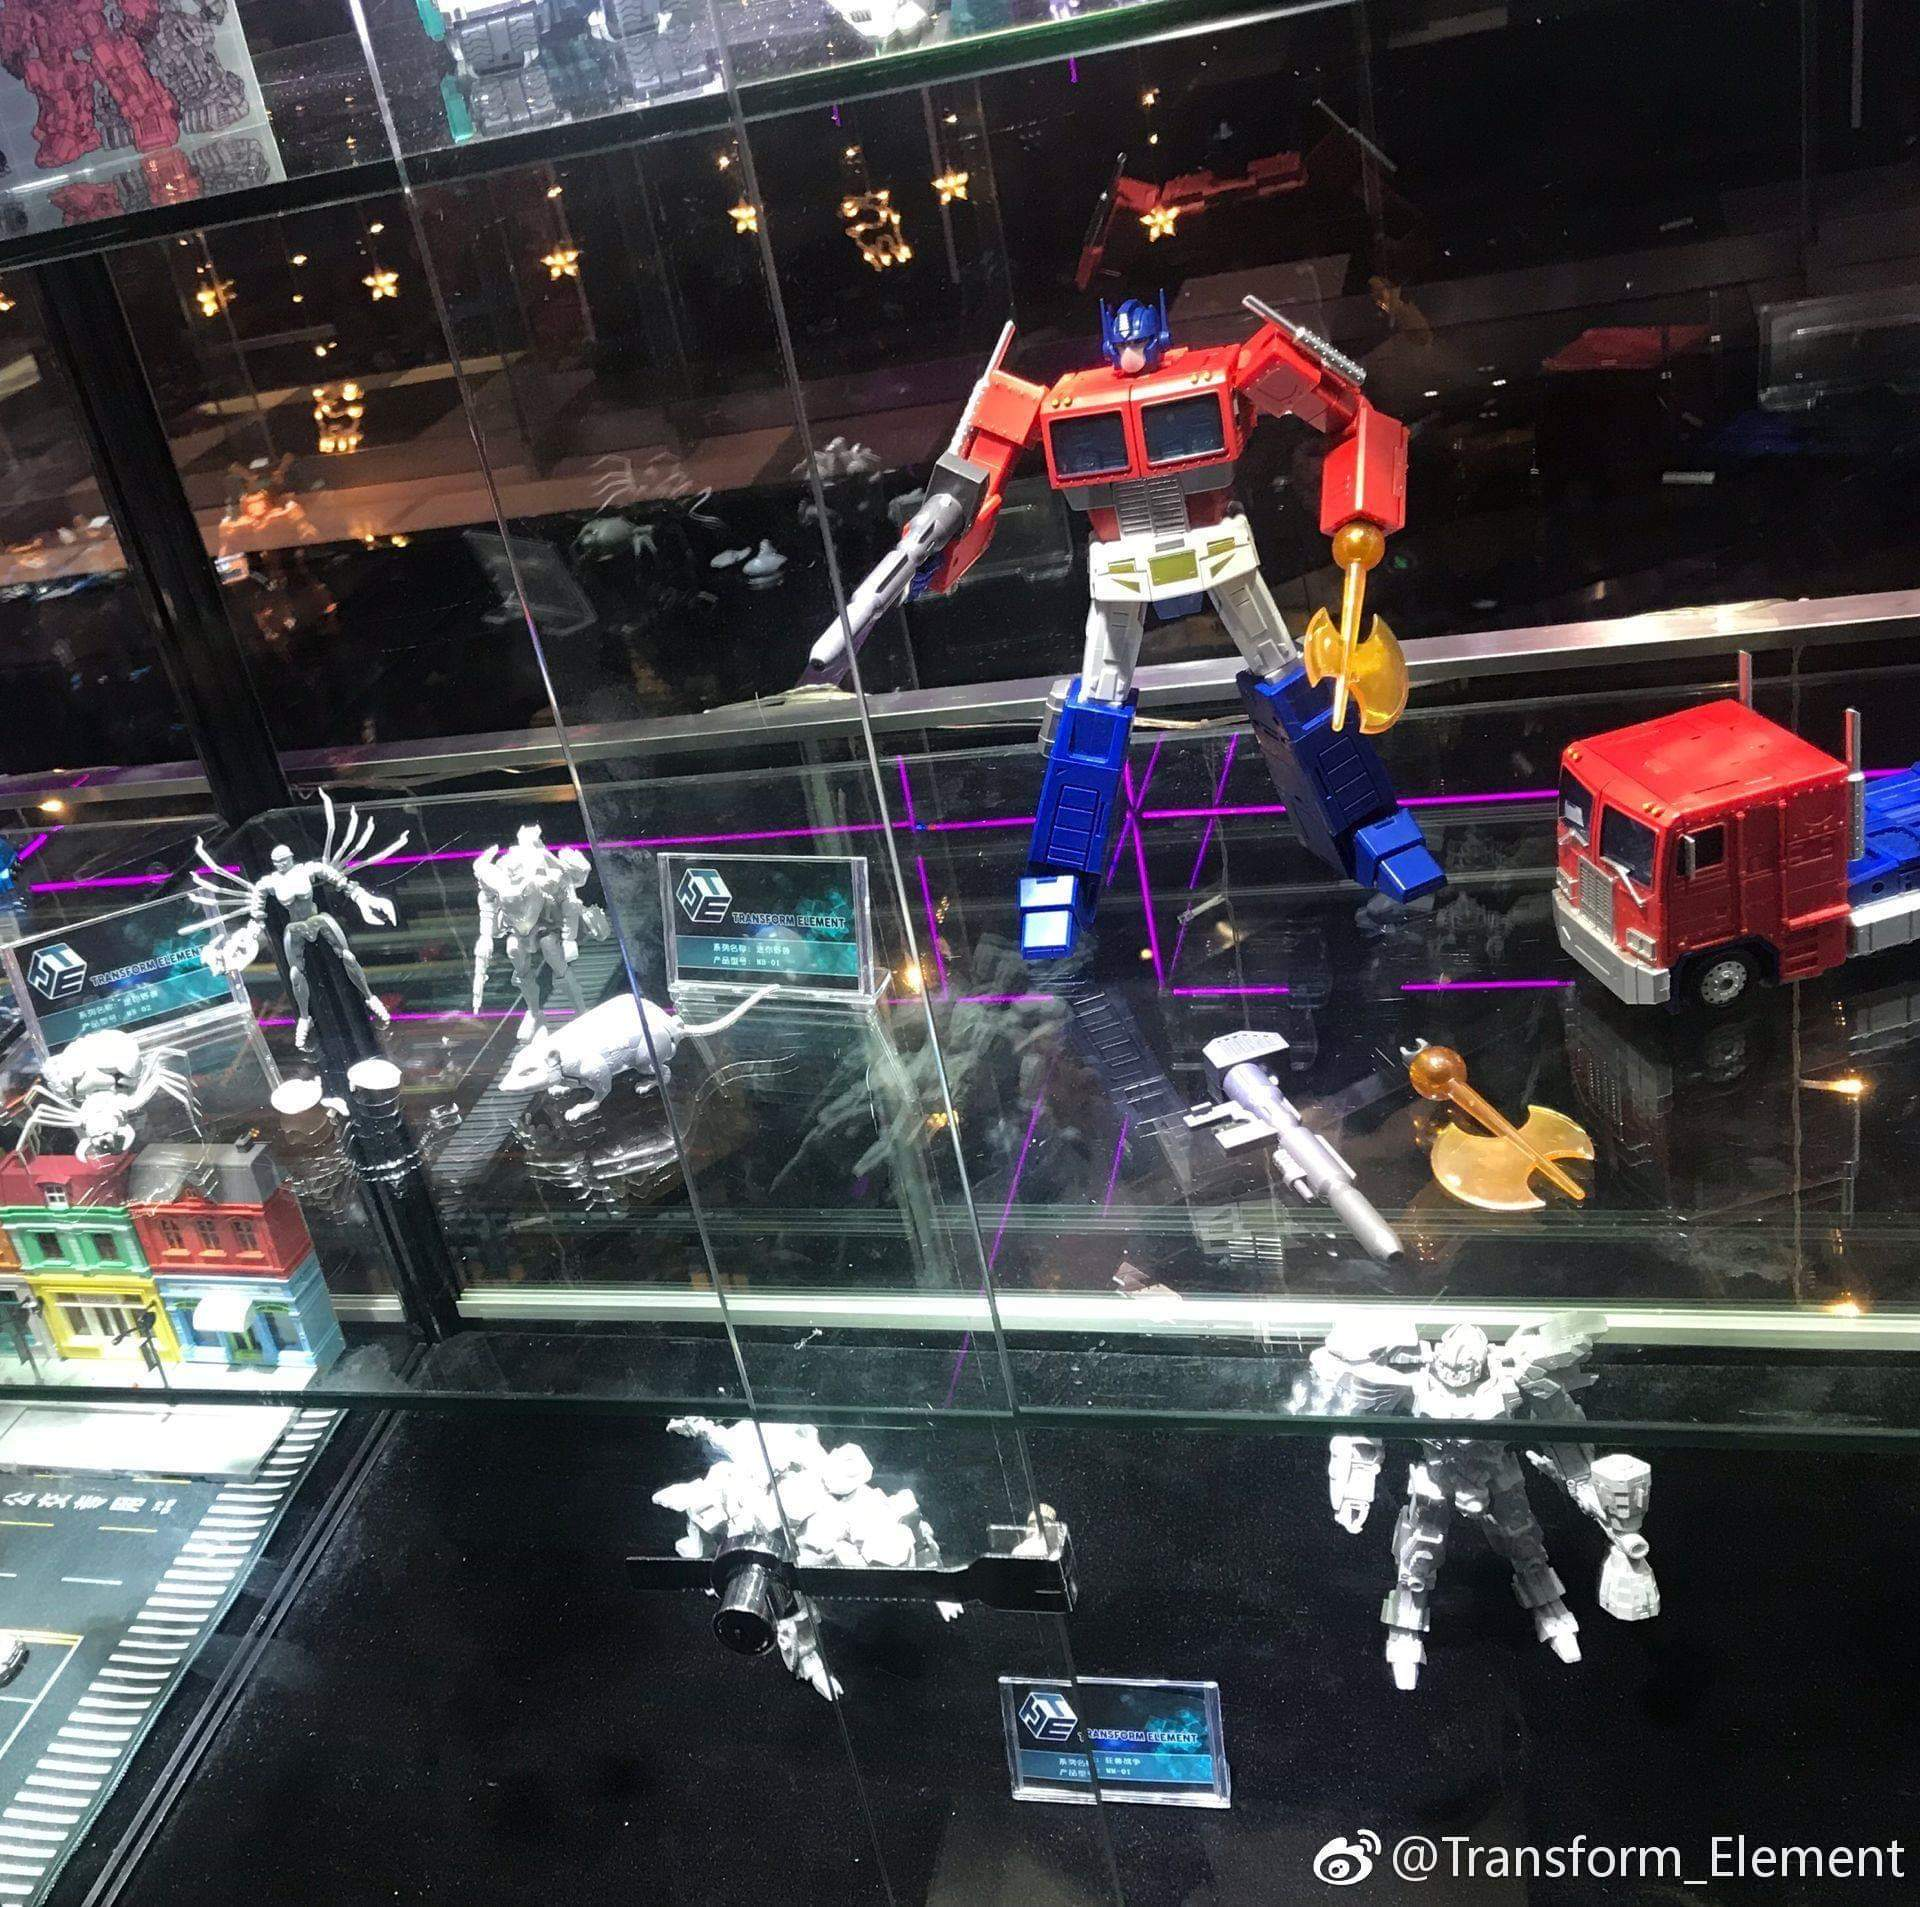 [Transform Element] Produit Tiers - TE-01 - aka Optimus Prime/Optimus Primus G1 TN4tRKpn_o